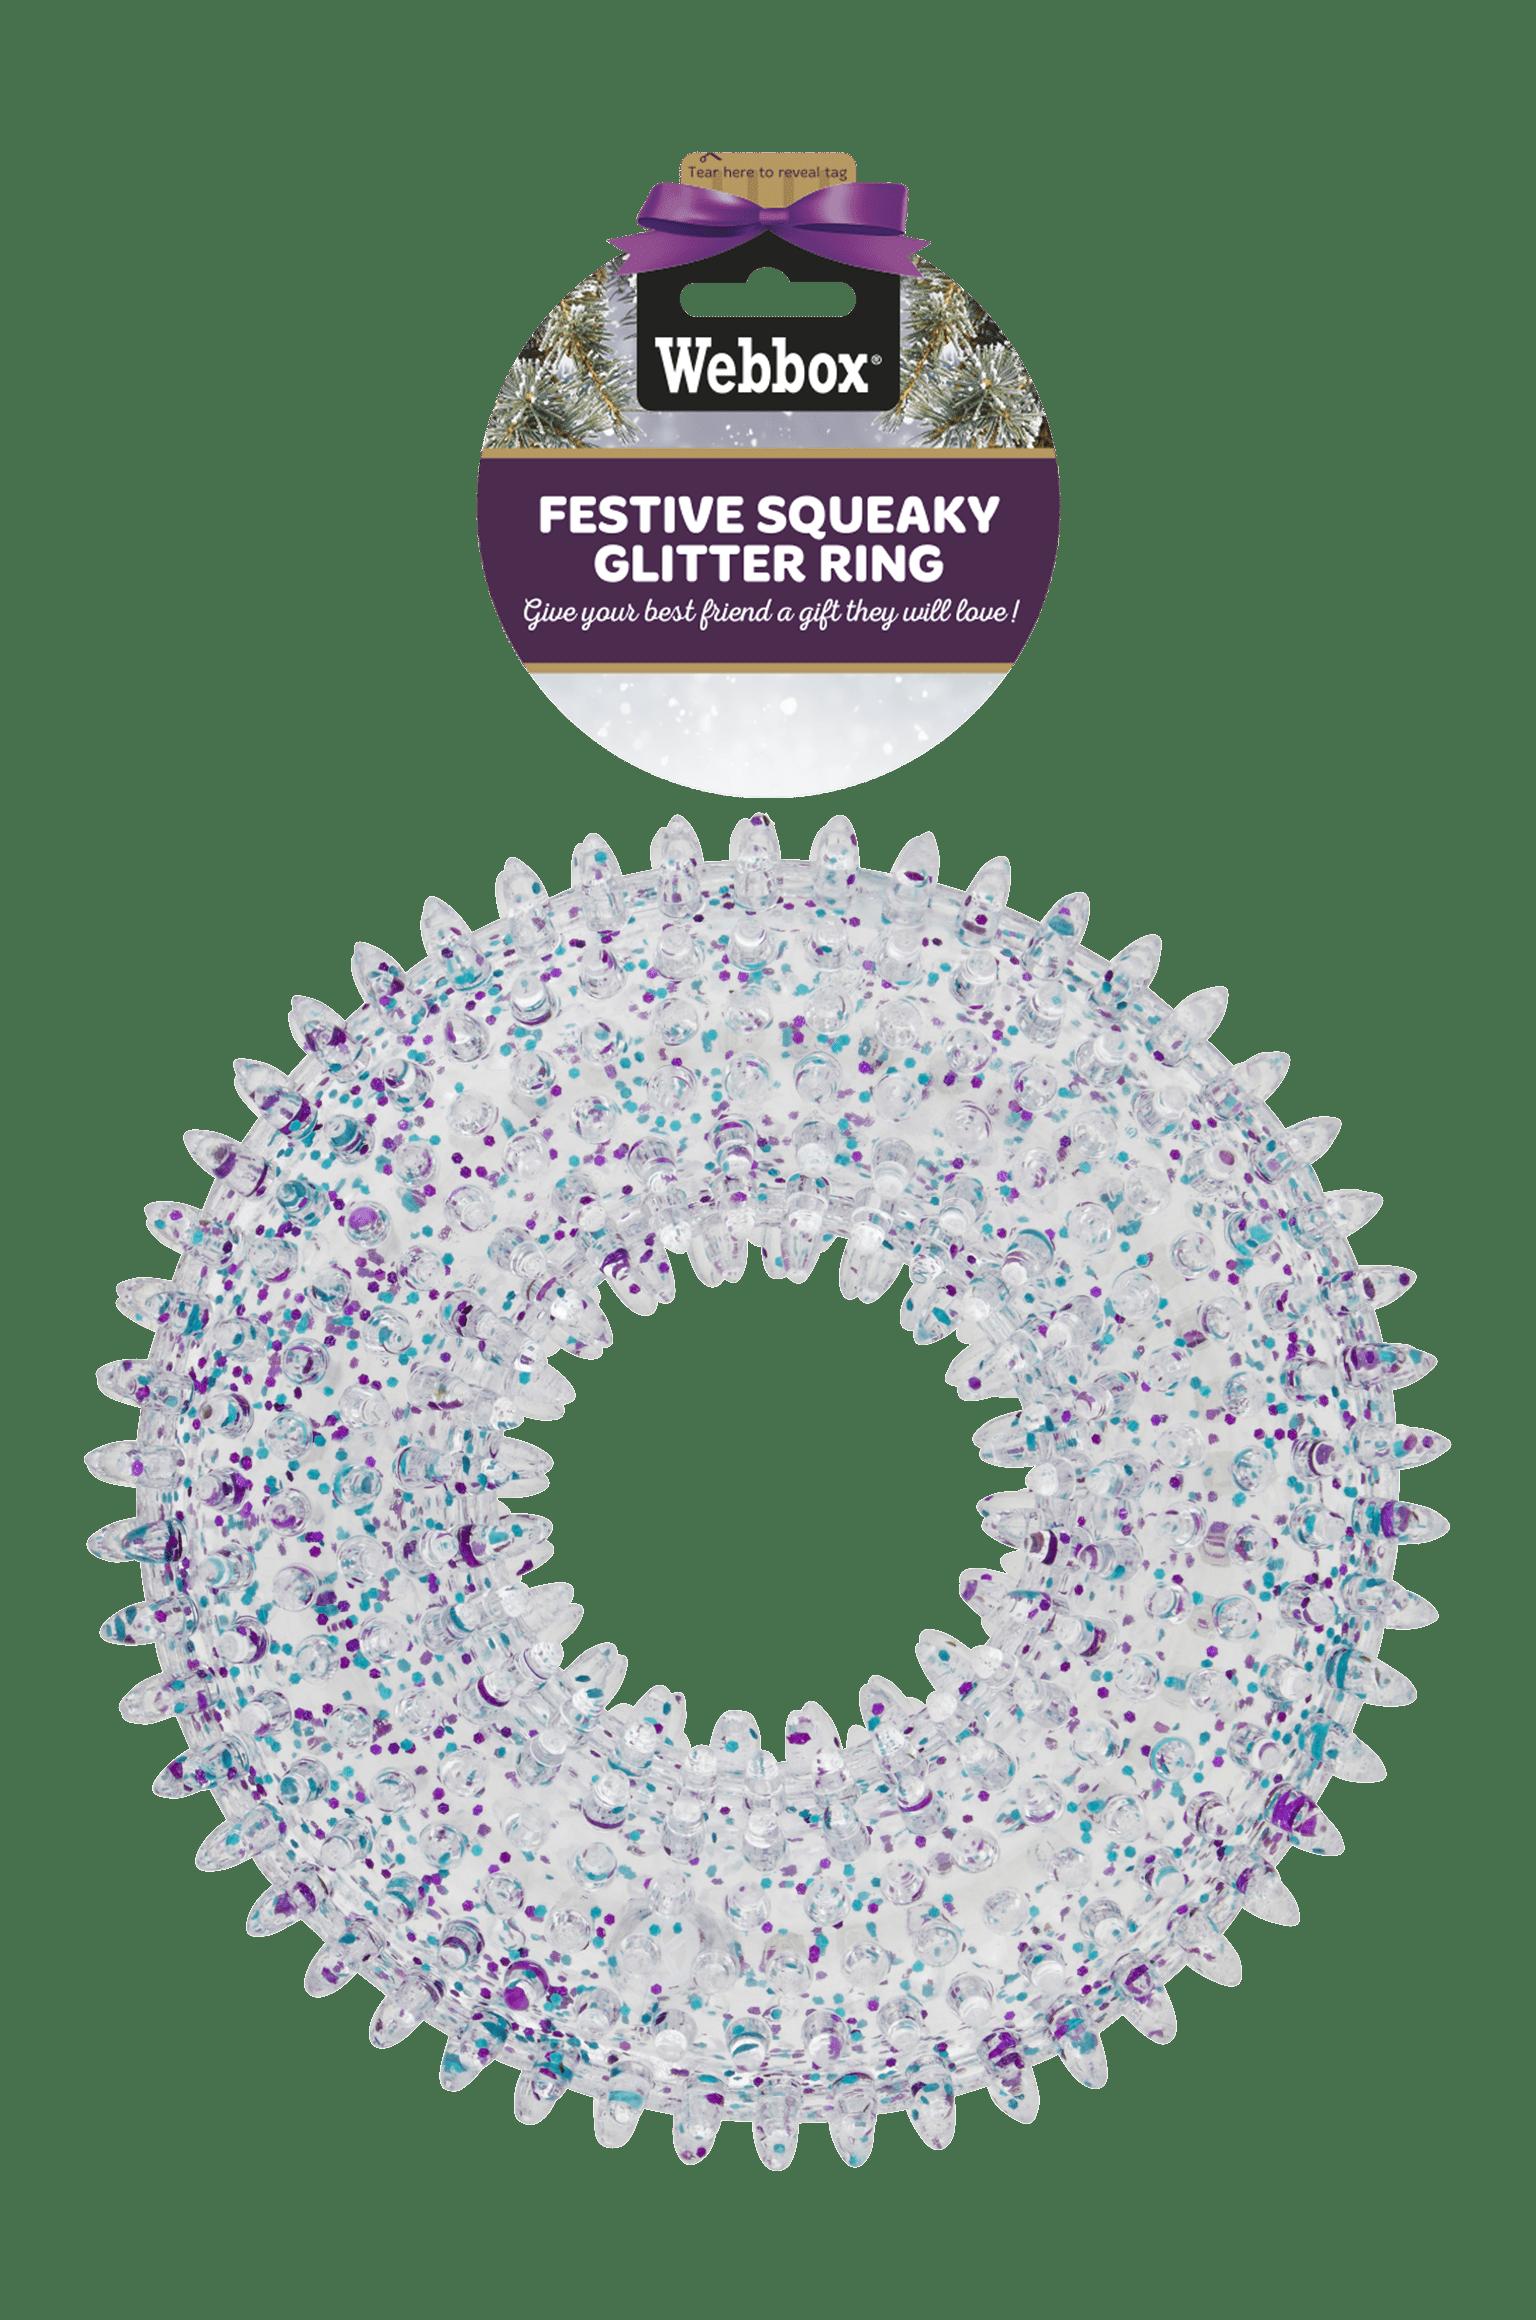 Webbox Festive Squeaky Glitter Ring